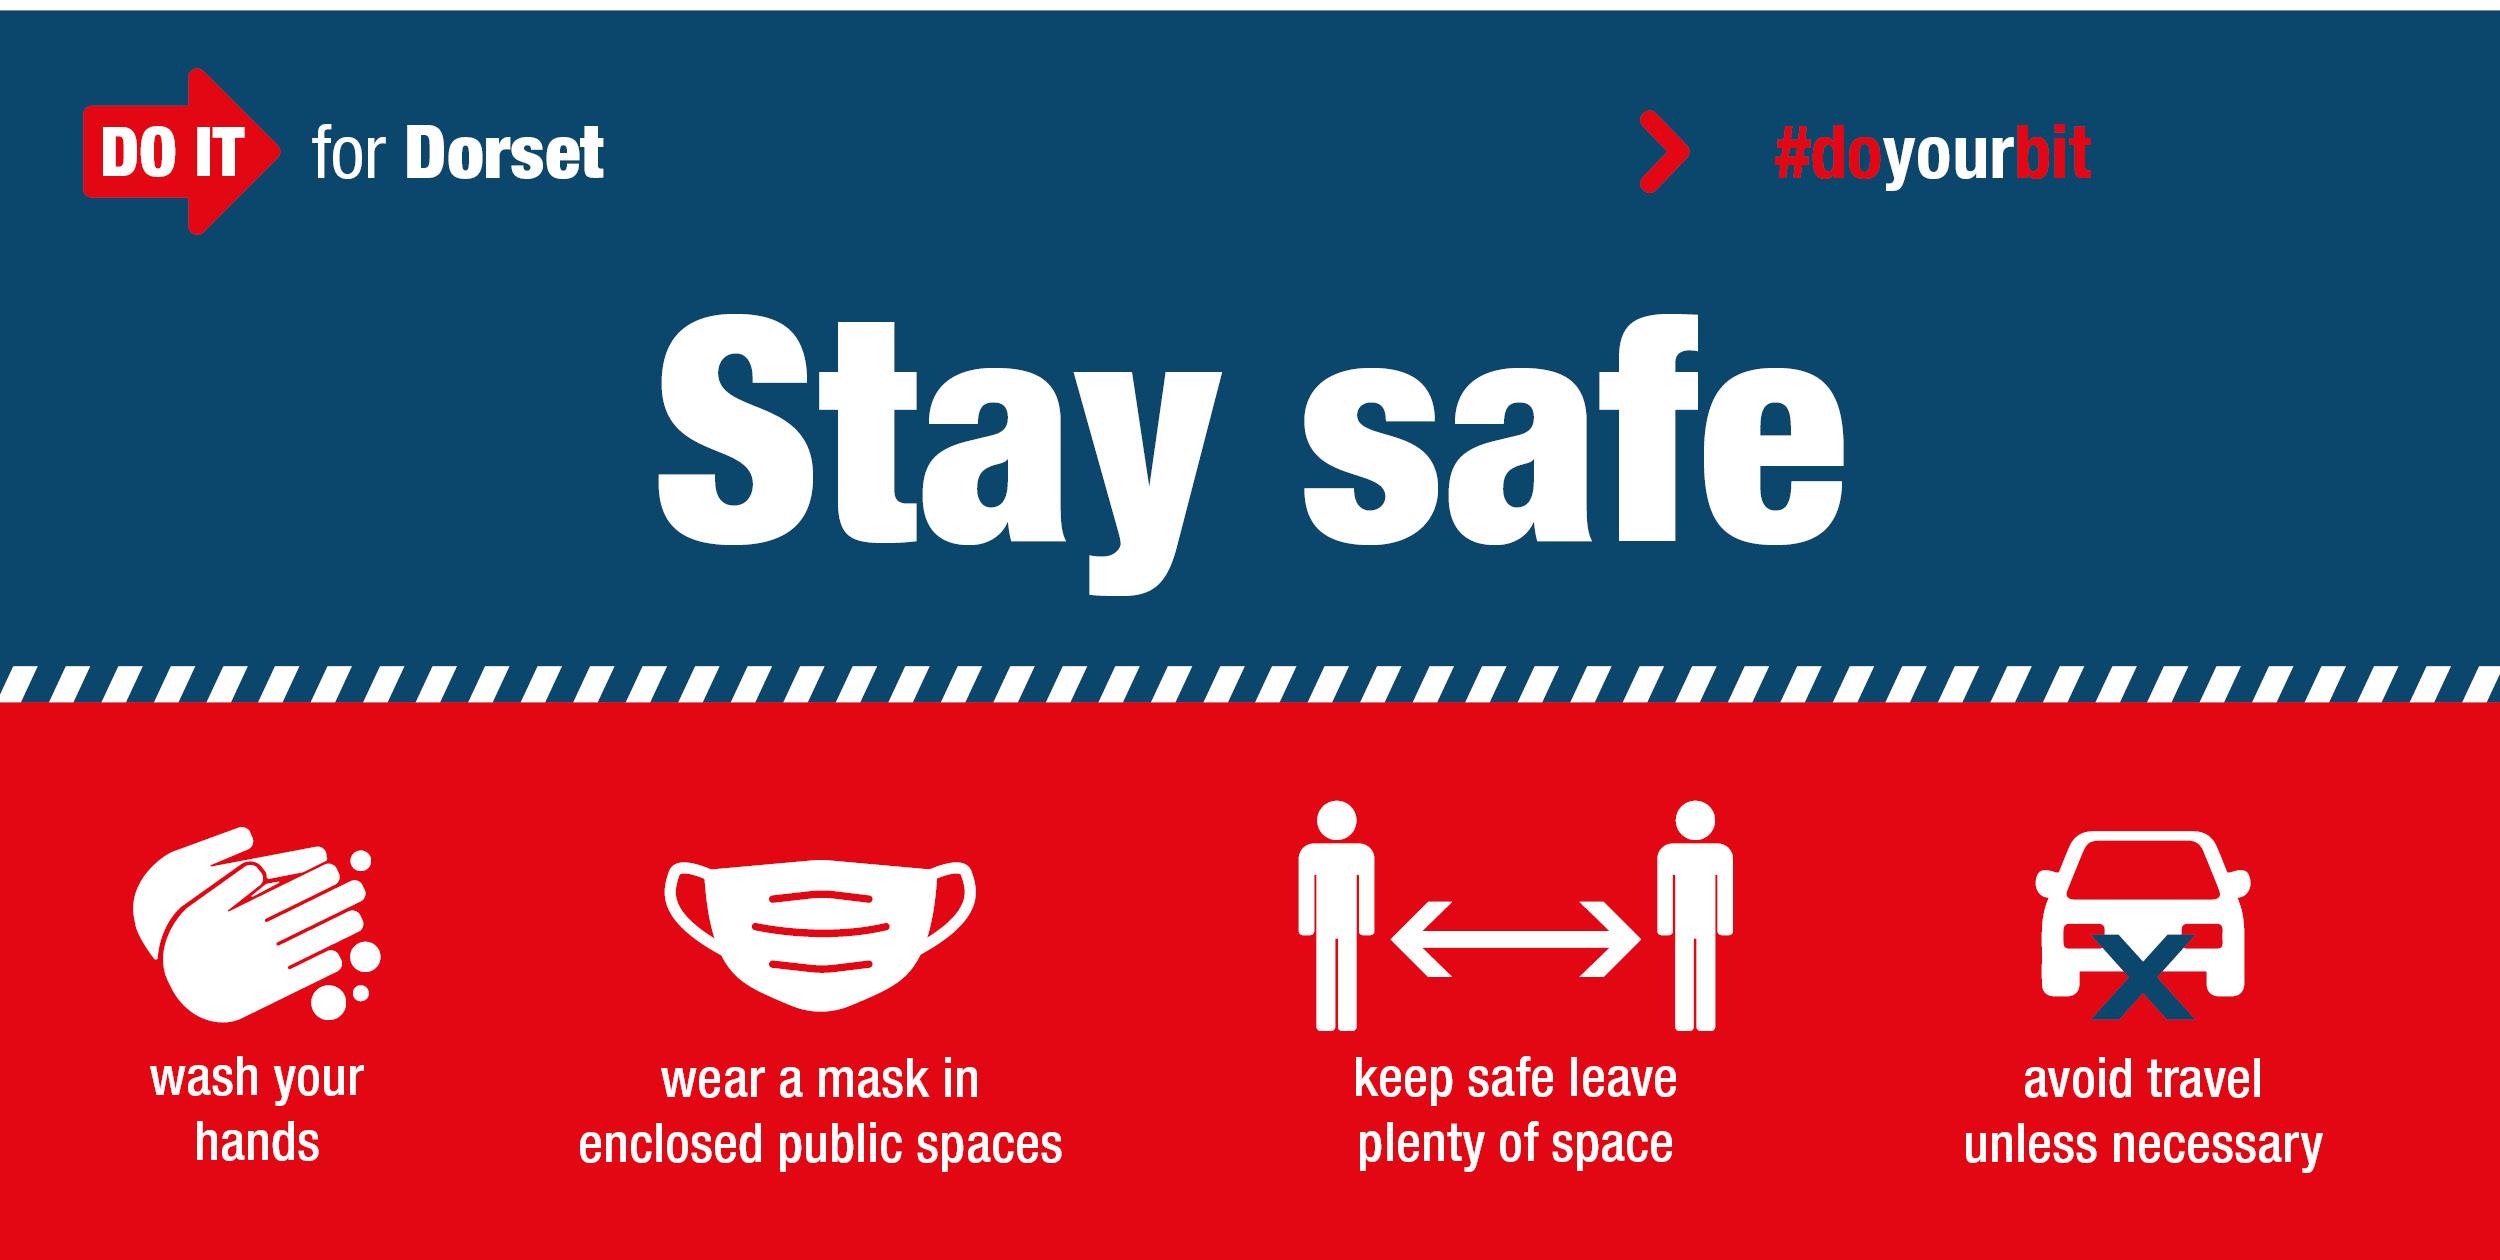 Stay safe - do it for Dorset.